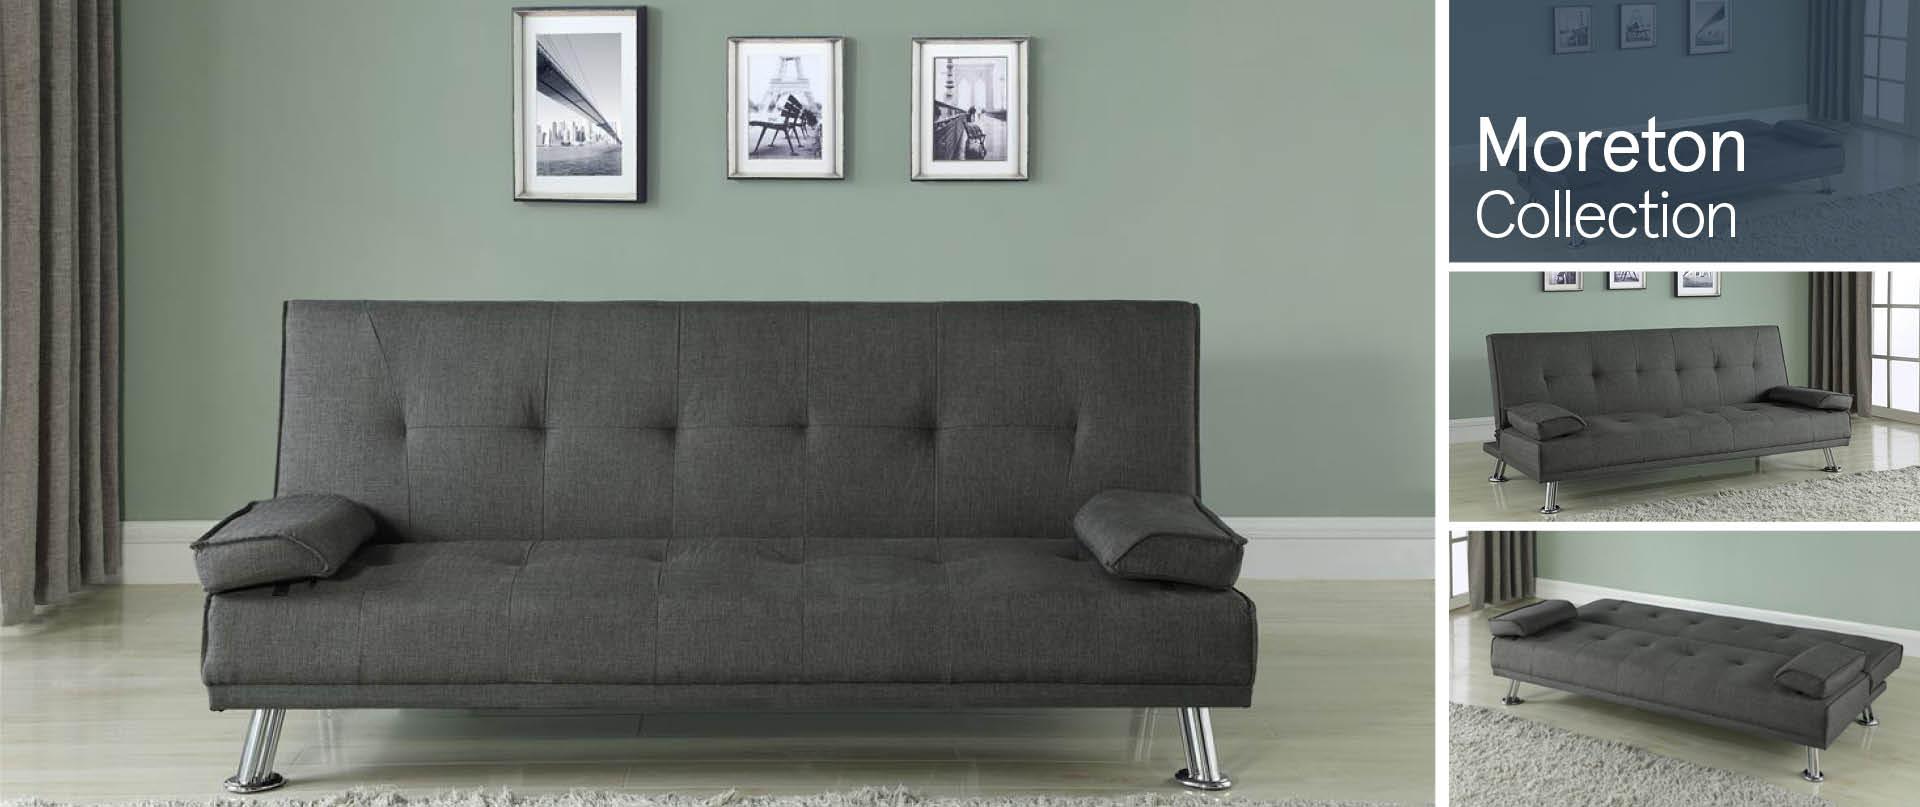 Moreton Fabric Sofa Ranges